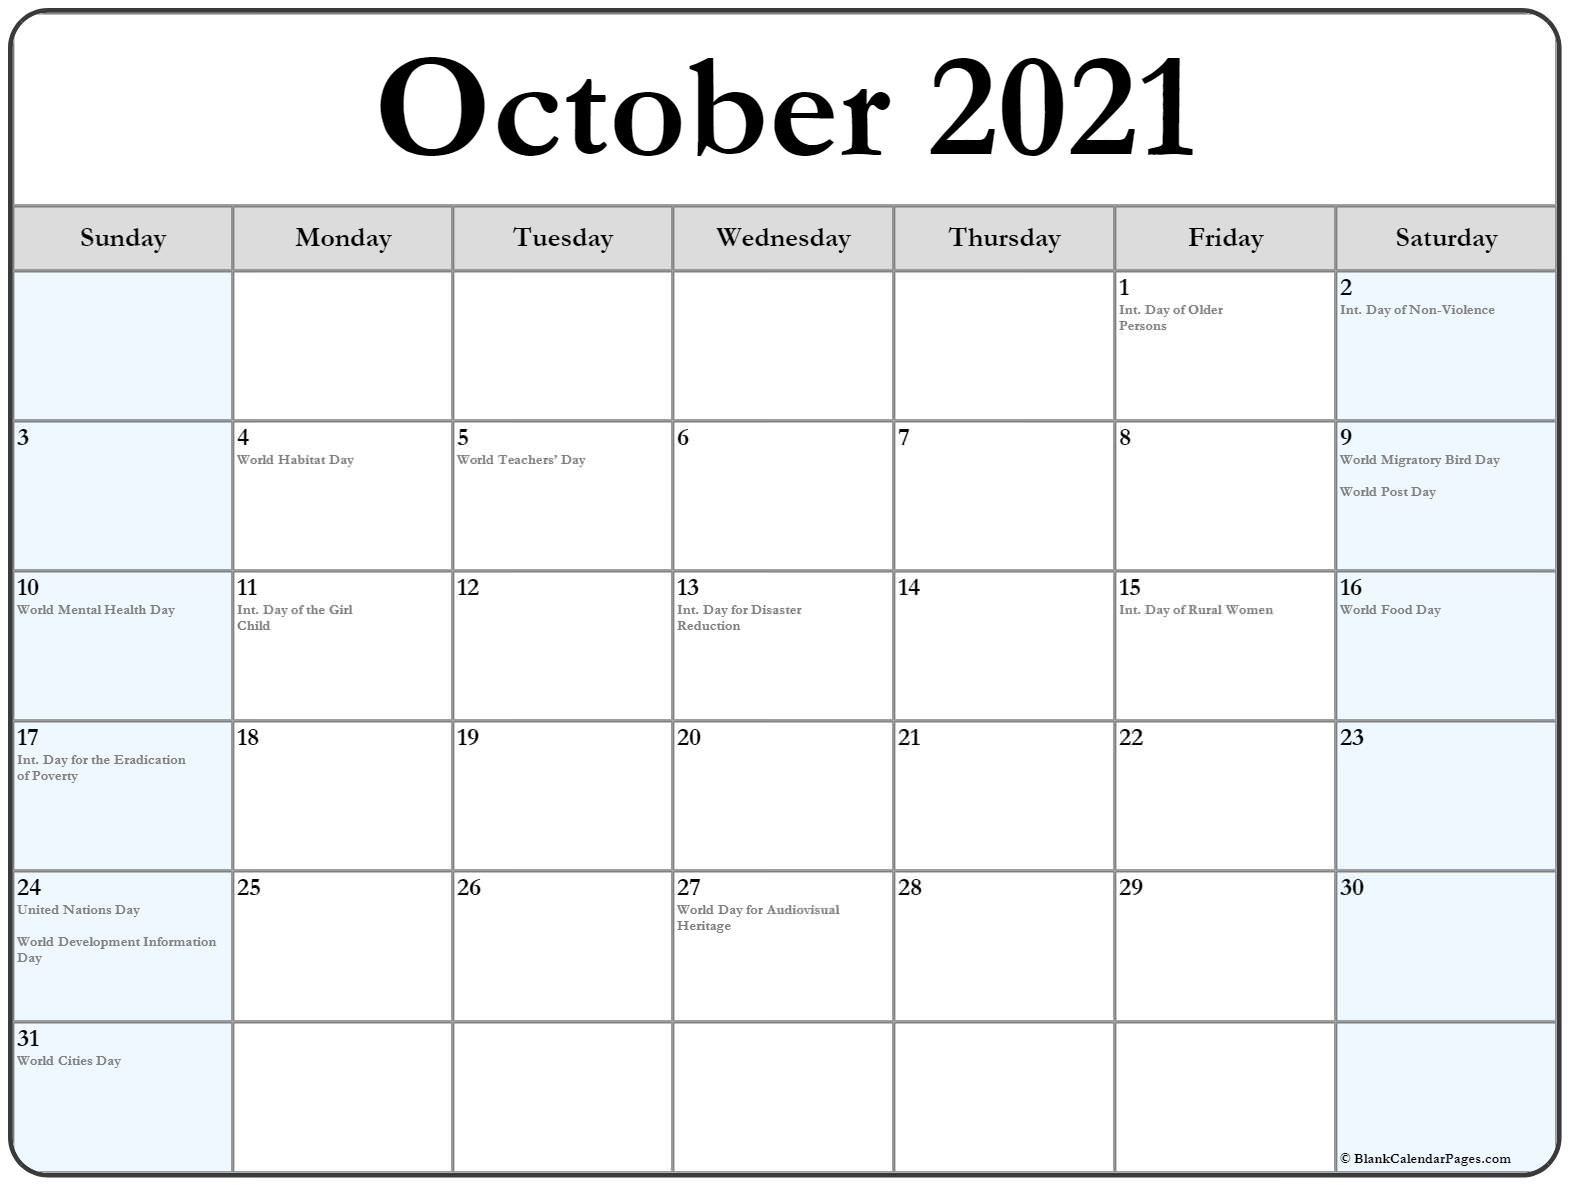 October 2021 Calendar With Holidays - Calendar Template 2021 For Wiki January 2022 Calendar